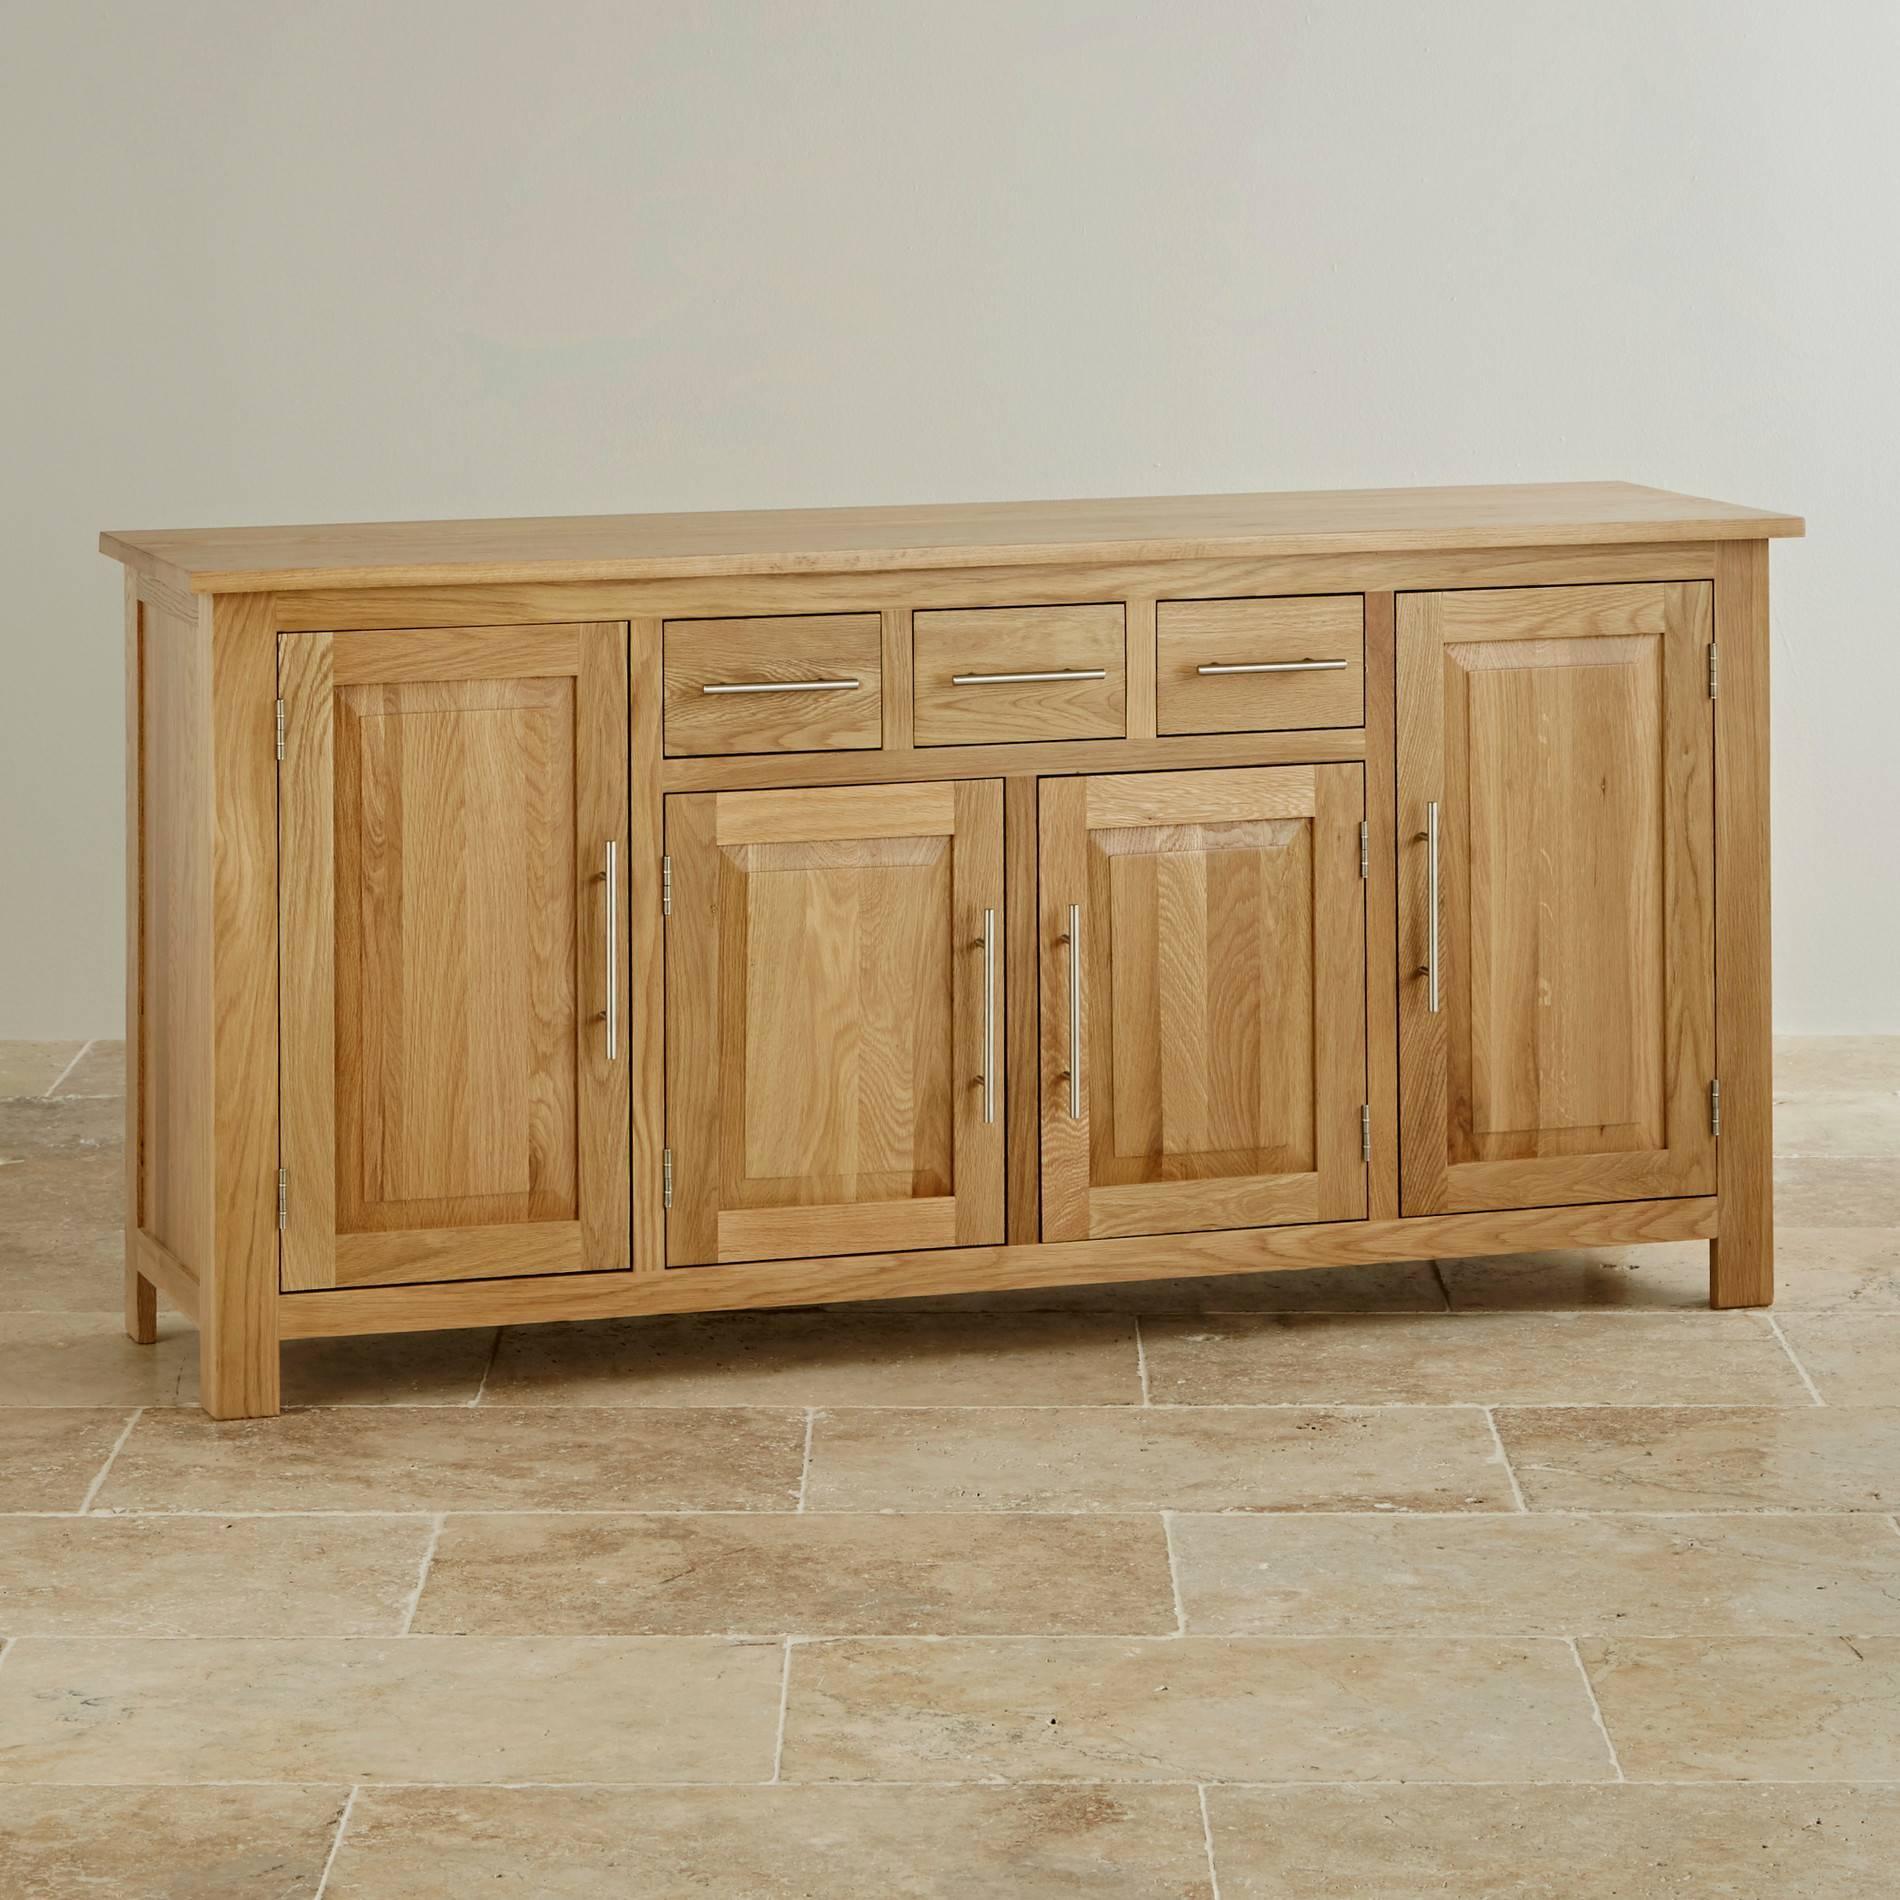 Inspiration about Rivermead Natural Solid Oak Large Sideboard | Oak Furniture Land Regarding Recent Cheap Oak Sideboards (#9 of 15)